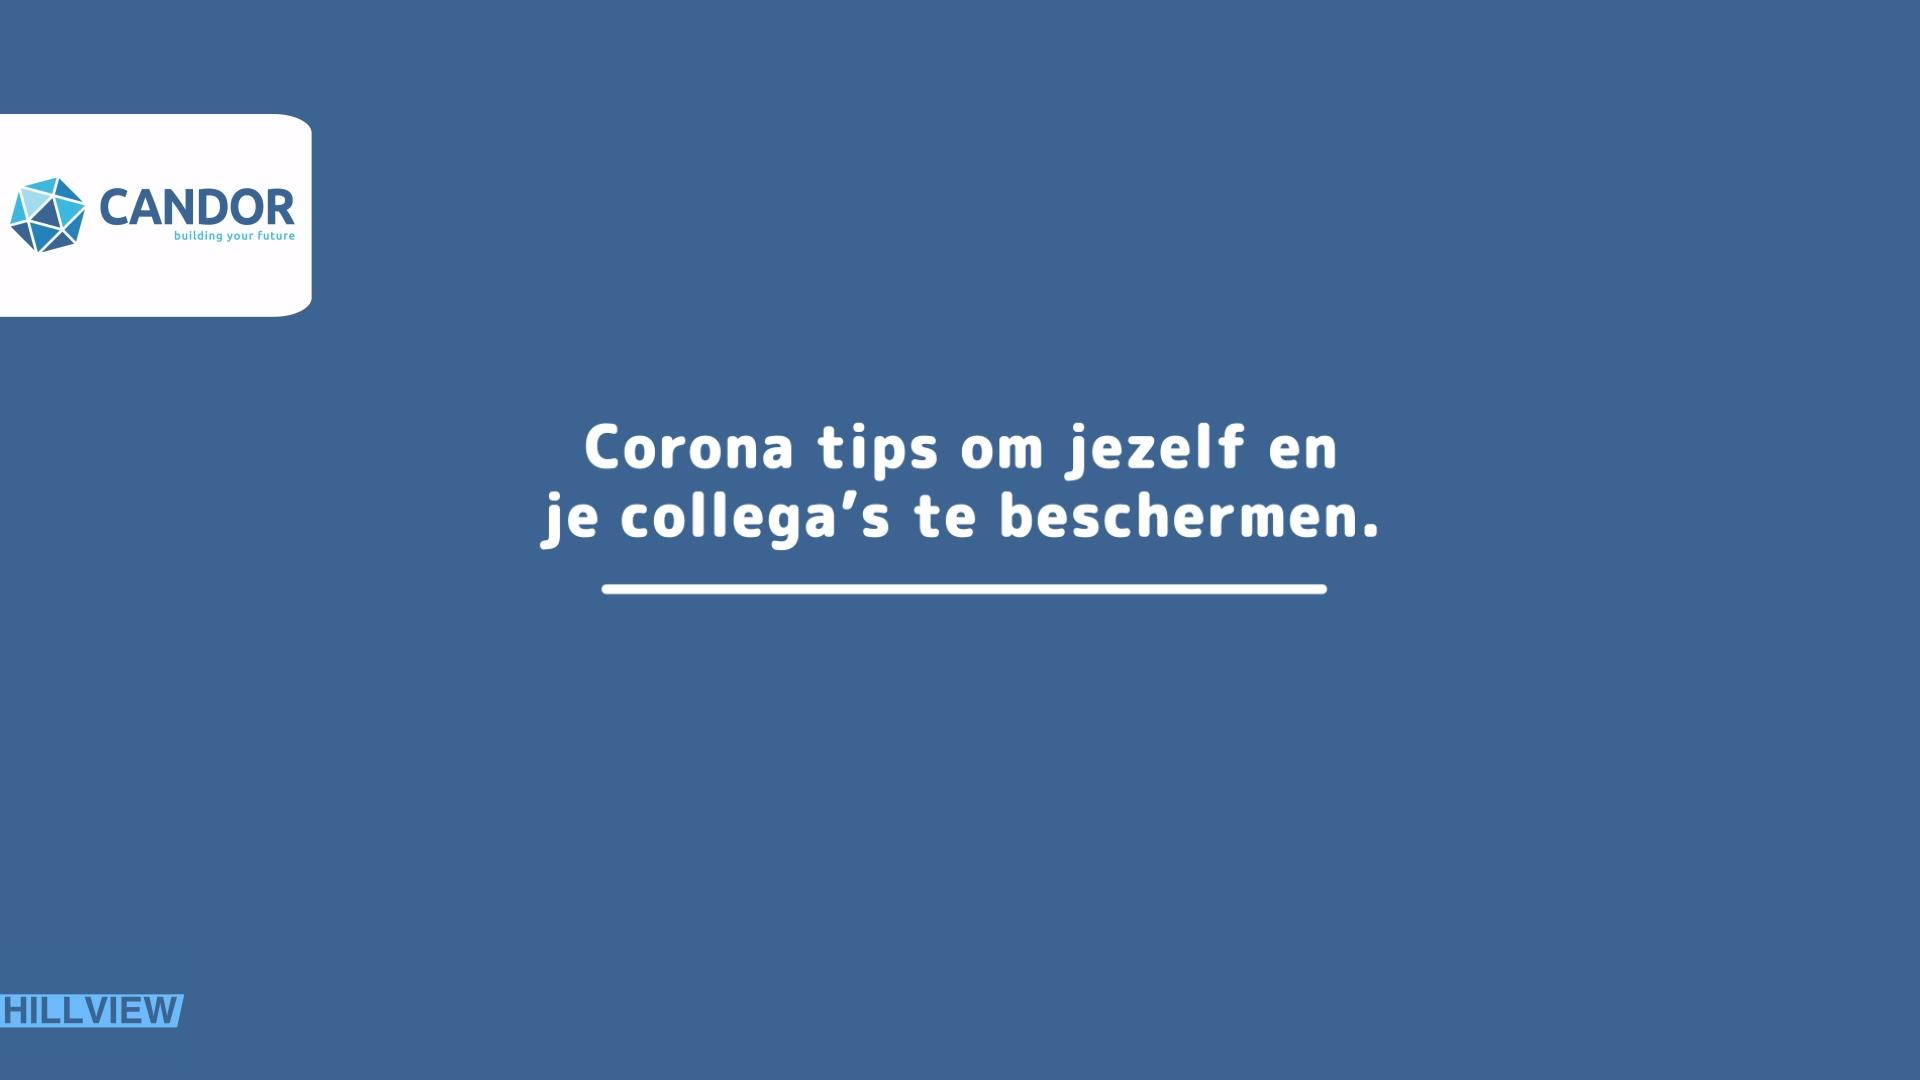 CANDOR_NL (1)